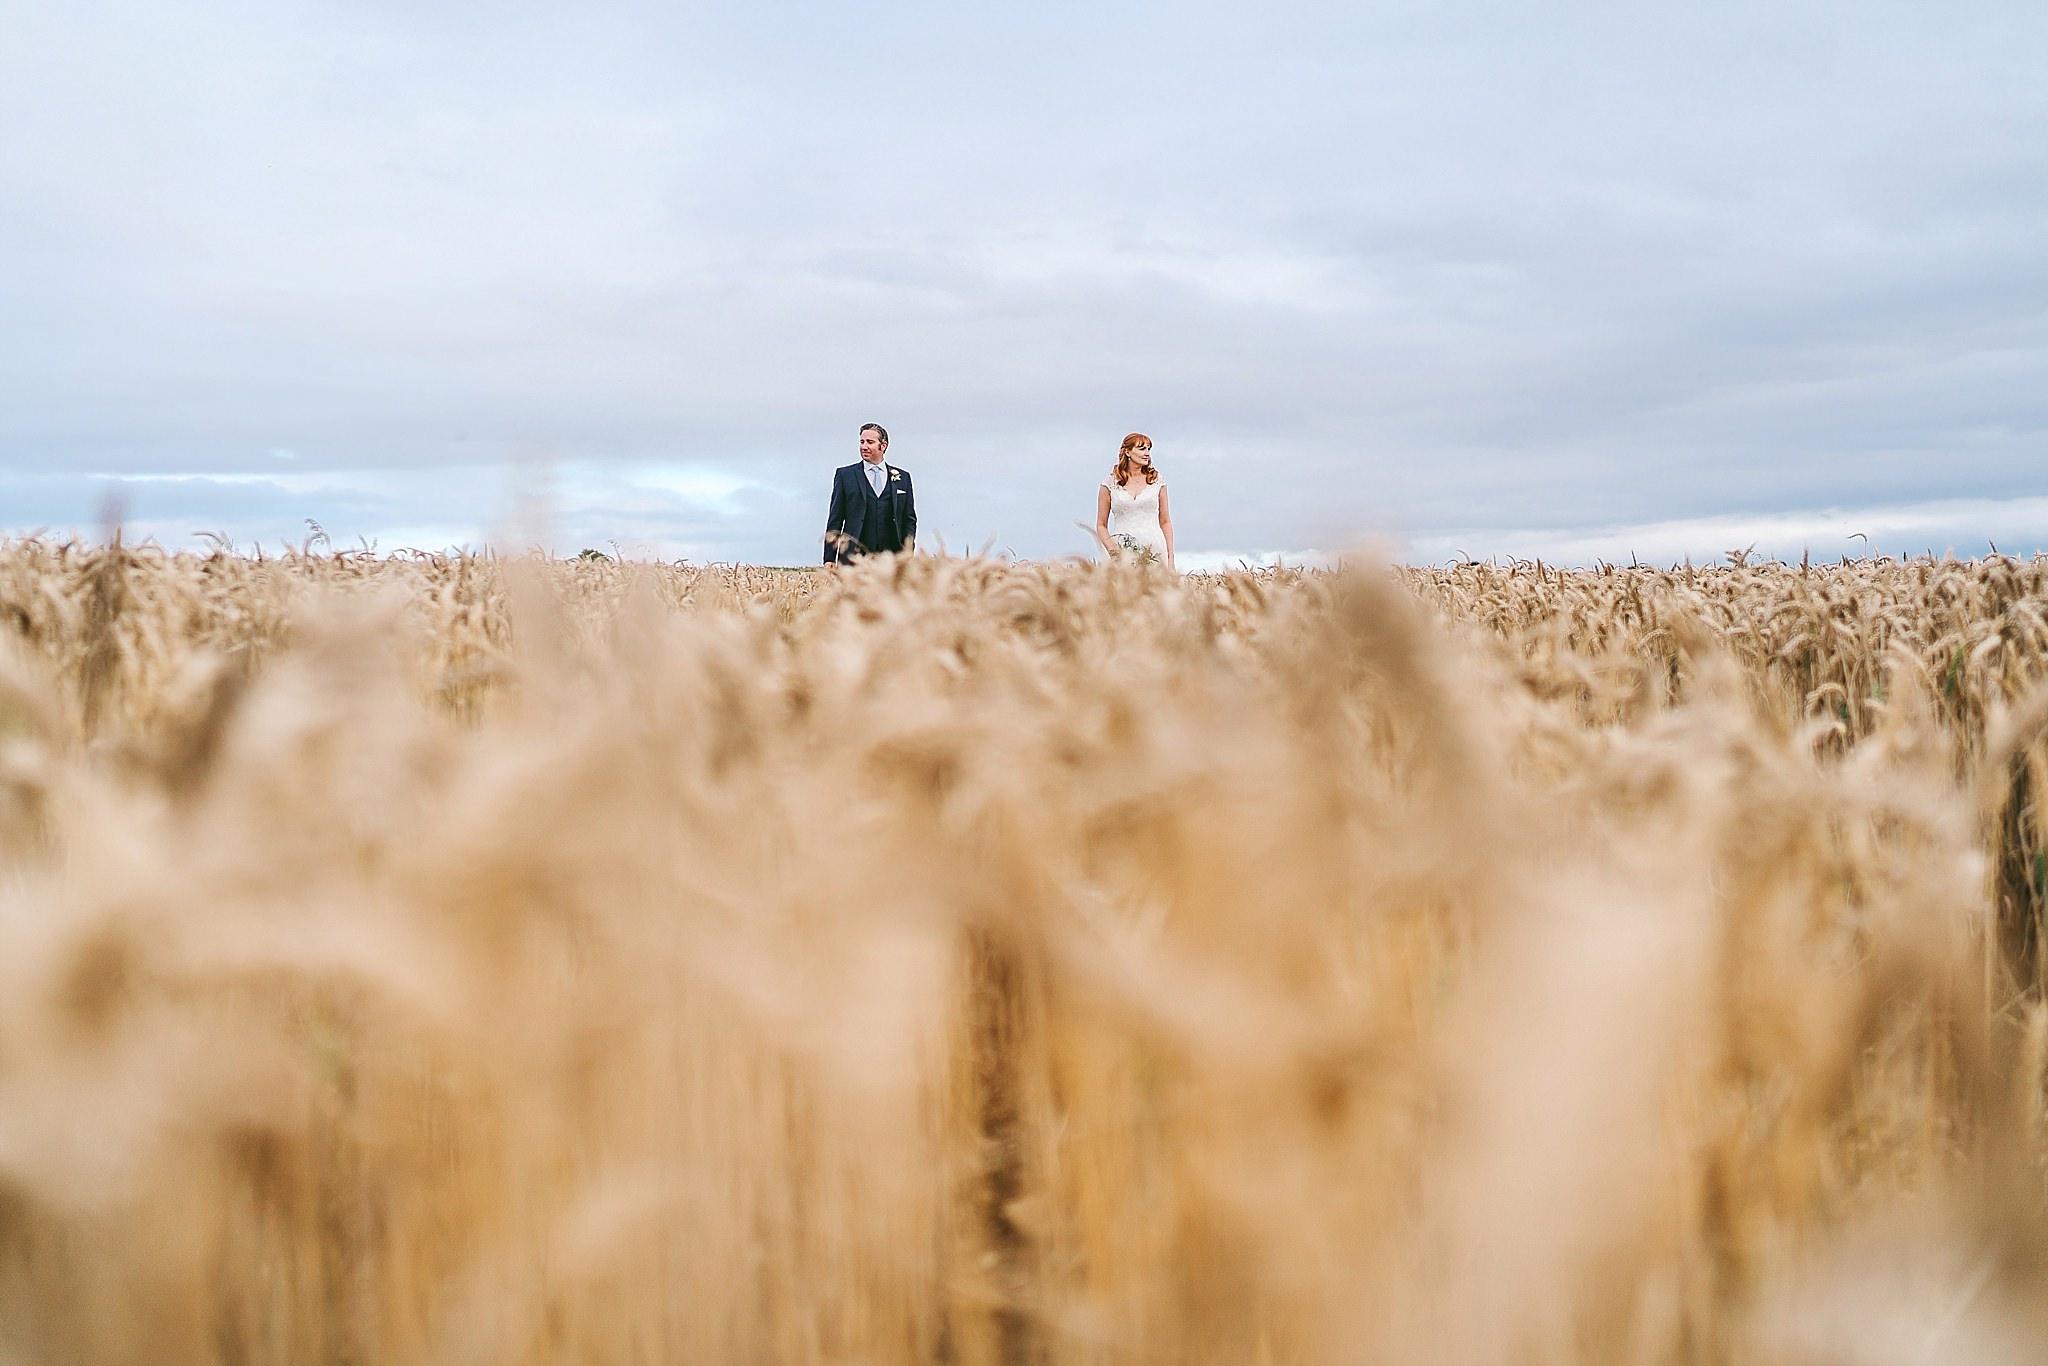 aga-tomaszek-wedding-photographer-cardiff-2016_1028